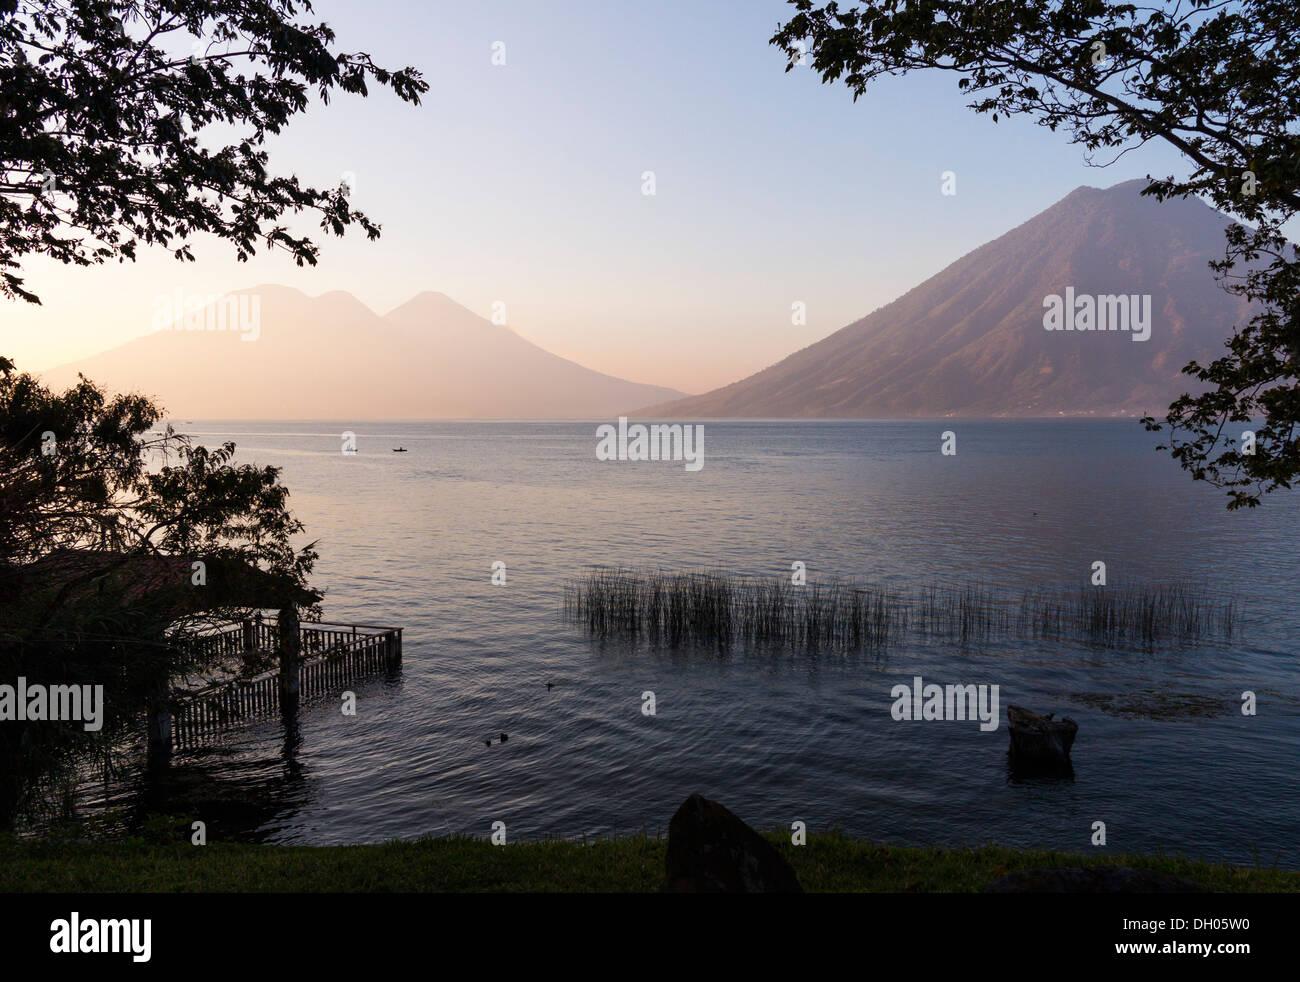 Lake Atitlan, Guatemala - Stock Image